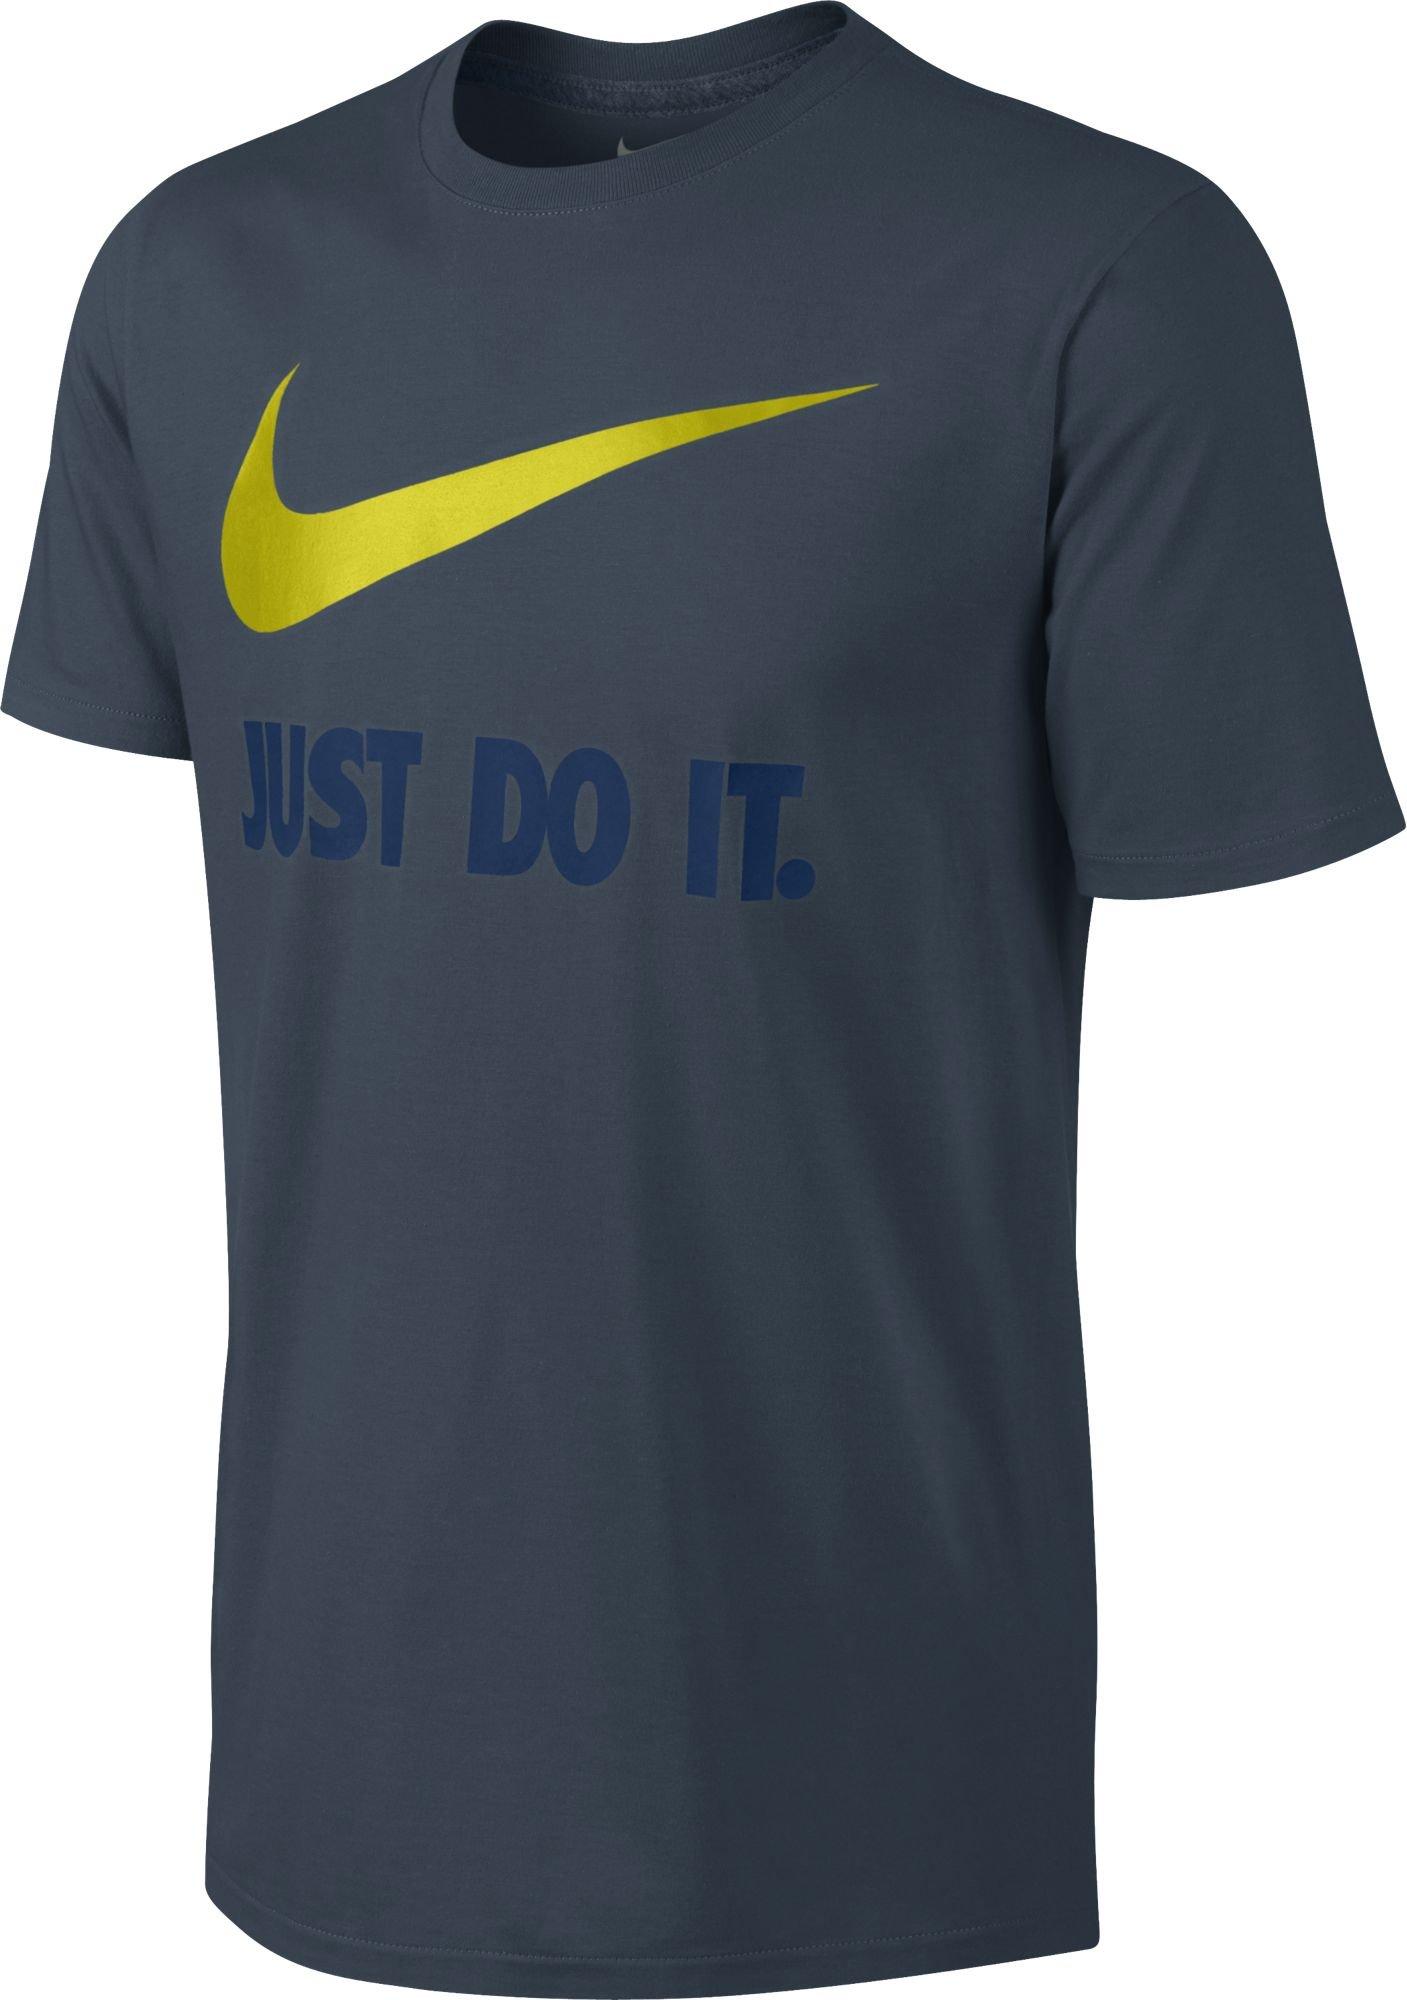 Nike Men's Sportswear Just Do It Swoosh Tee 707360-464 (Industrial Blue/Volt/Dark Obsidian, Small)